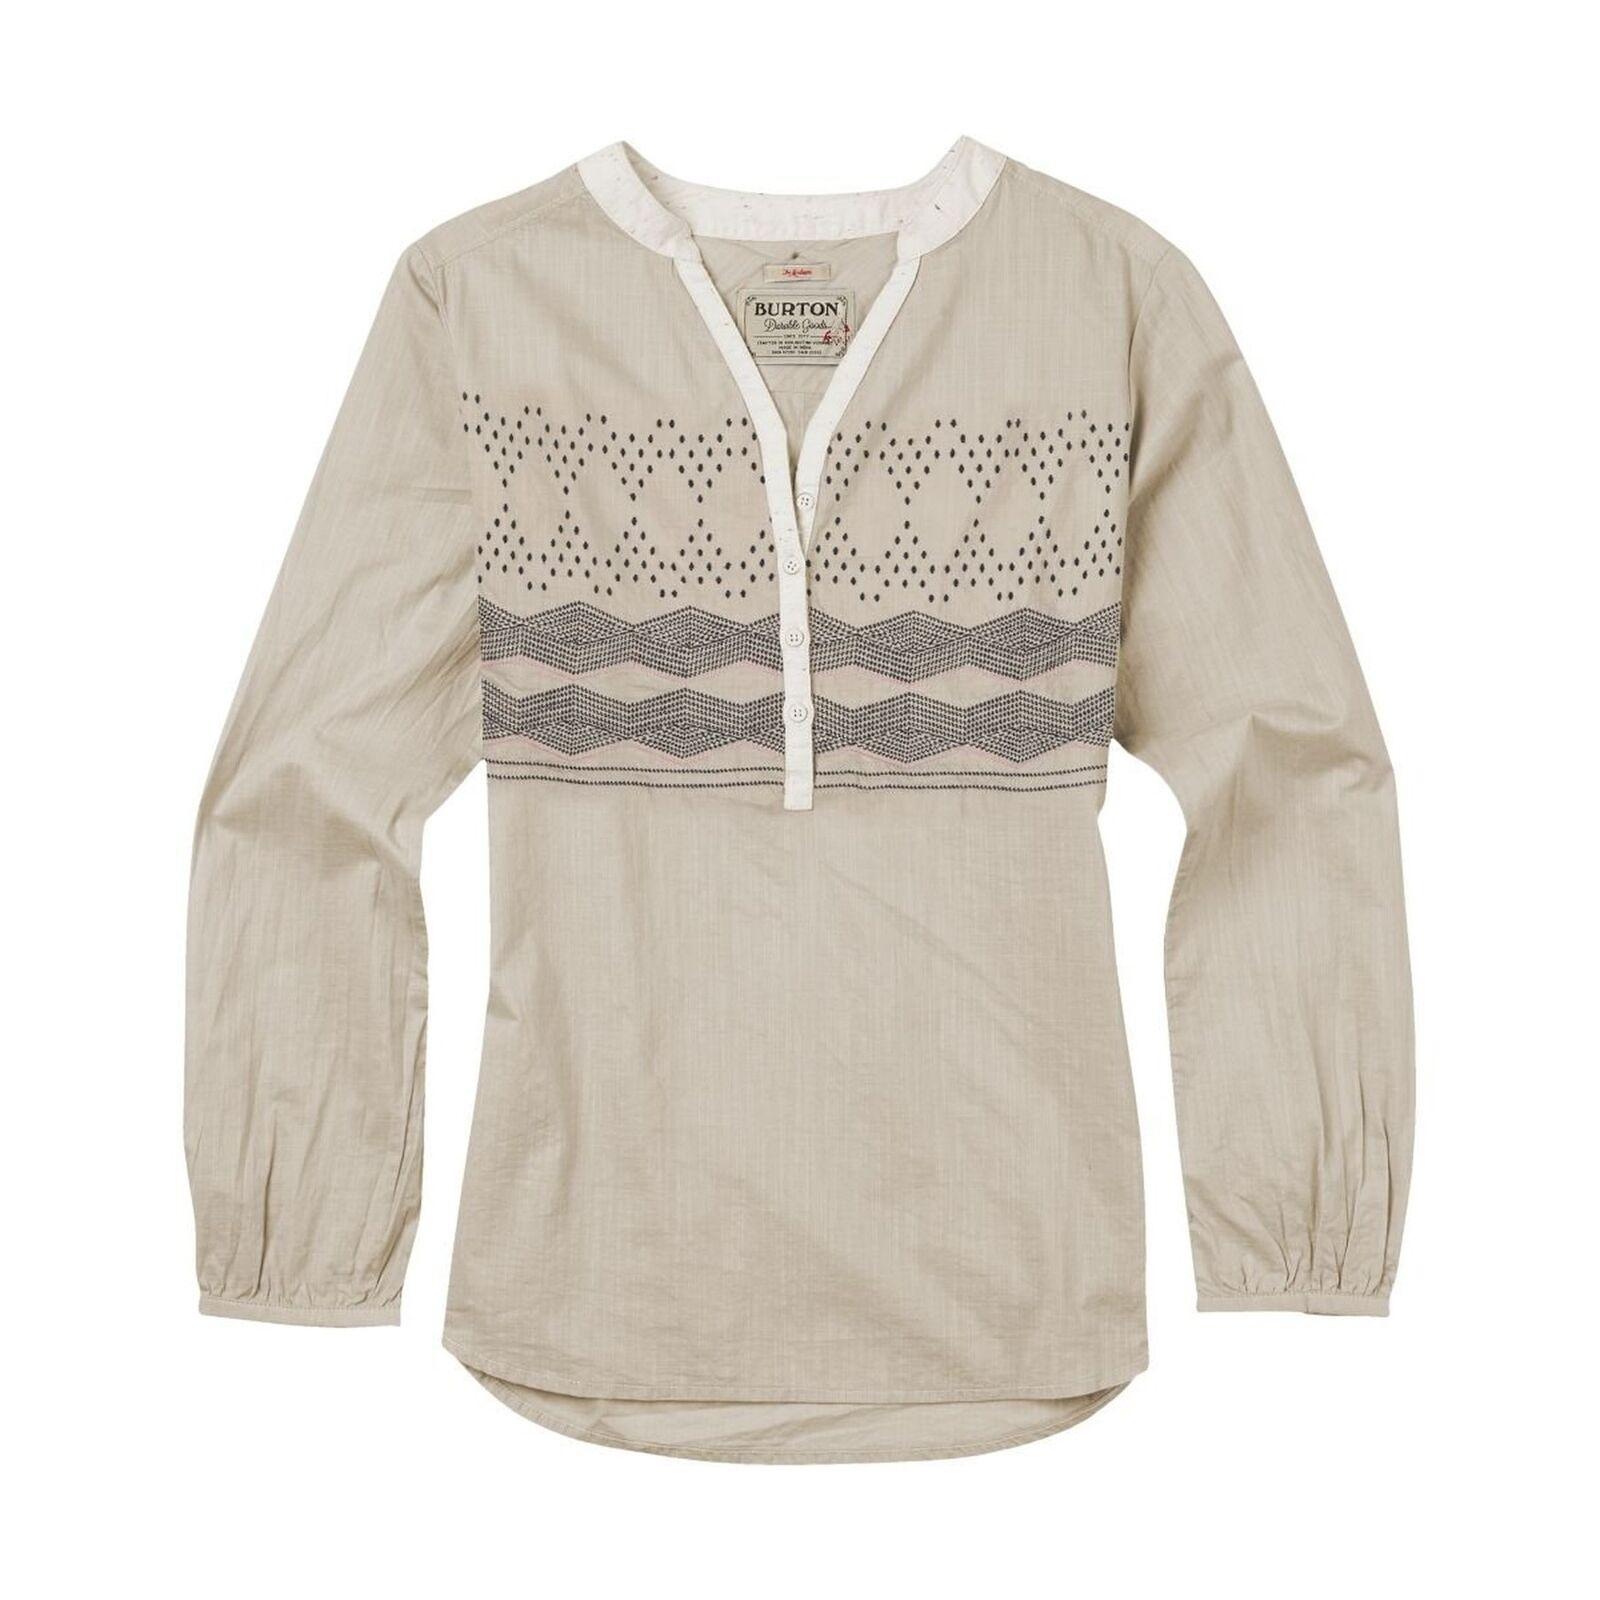 dbc0c45b Burton Women's Waterbury Woven Top Shirt Dove Heather Ethnic Stripe Small